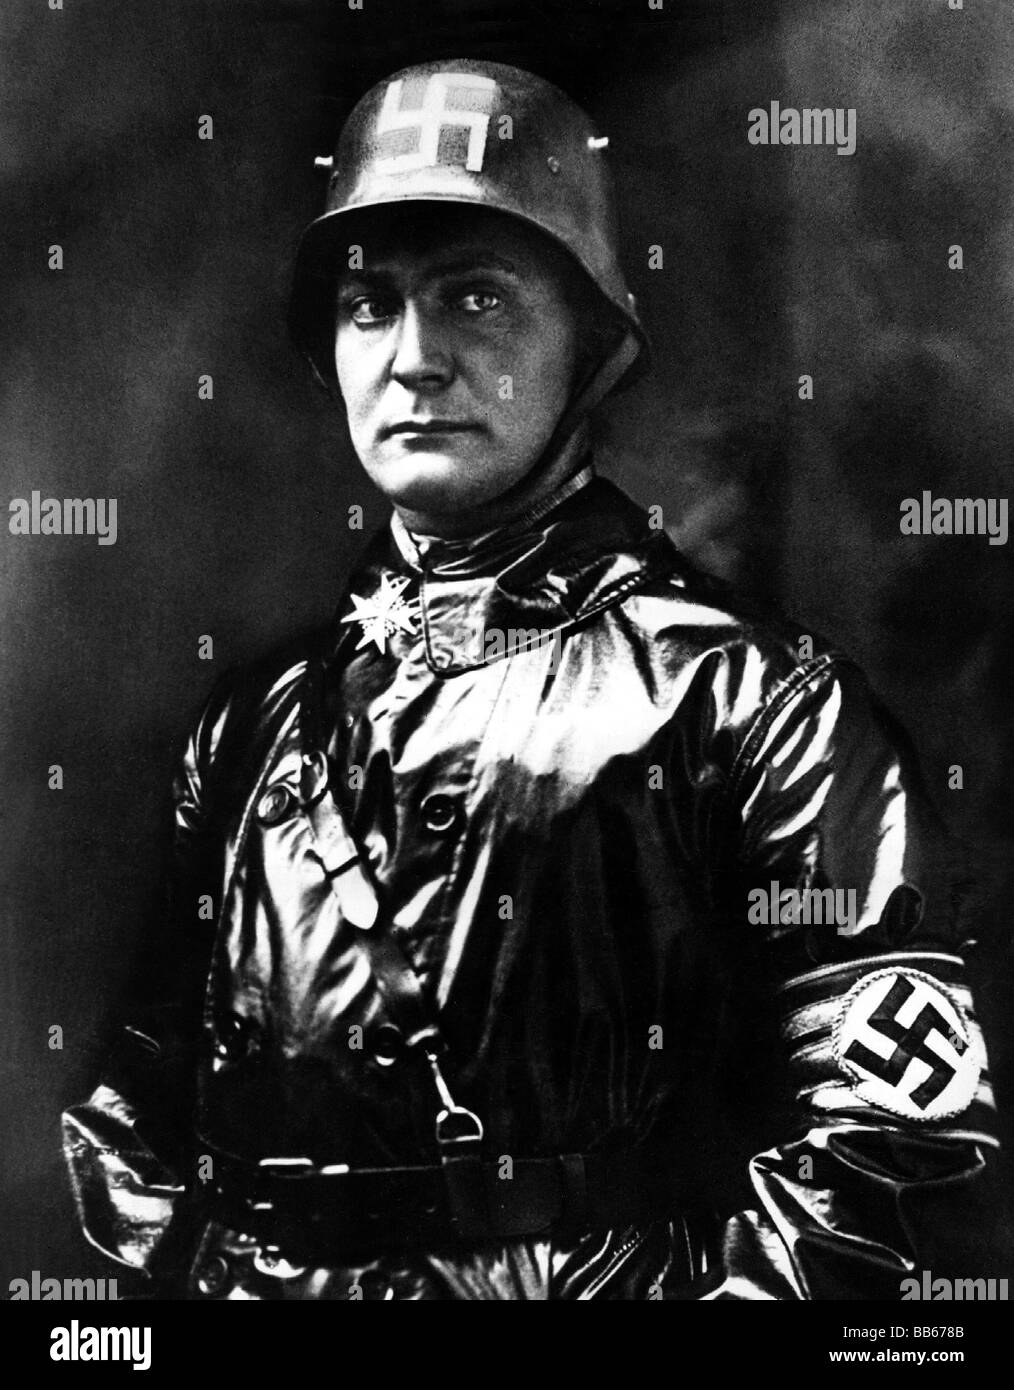 Goering, Hermann, 12.1.1893 - 15.10.1946, German politician (NSDAP), as Commander of SA, 1923, half length, , Additional - Stock Image